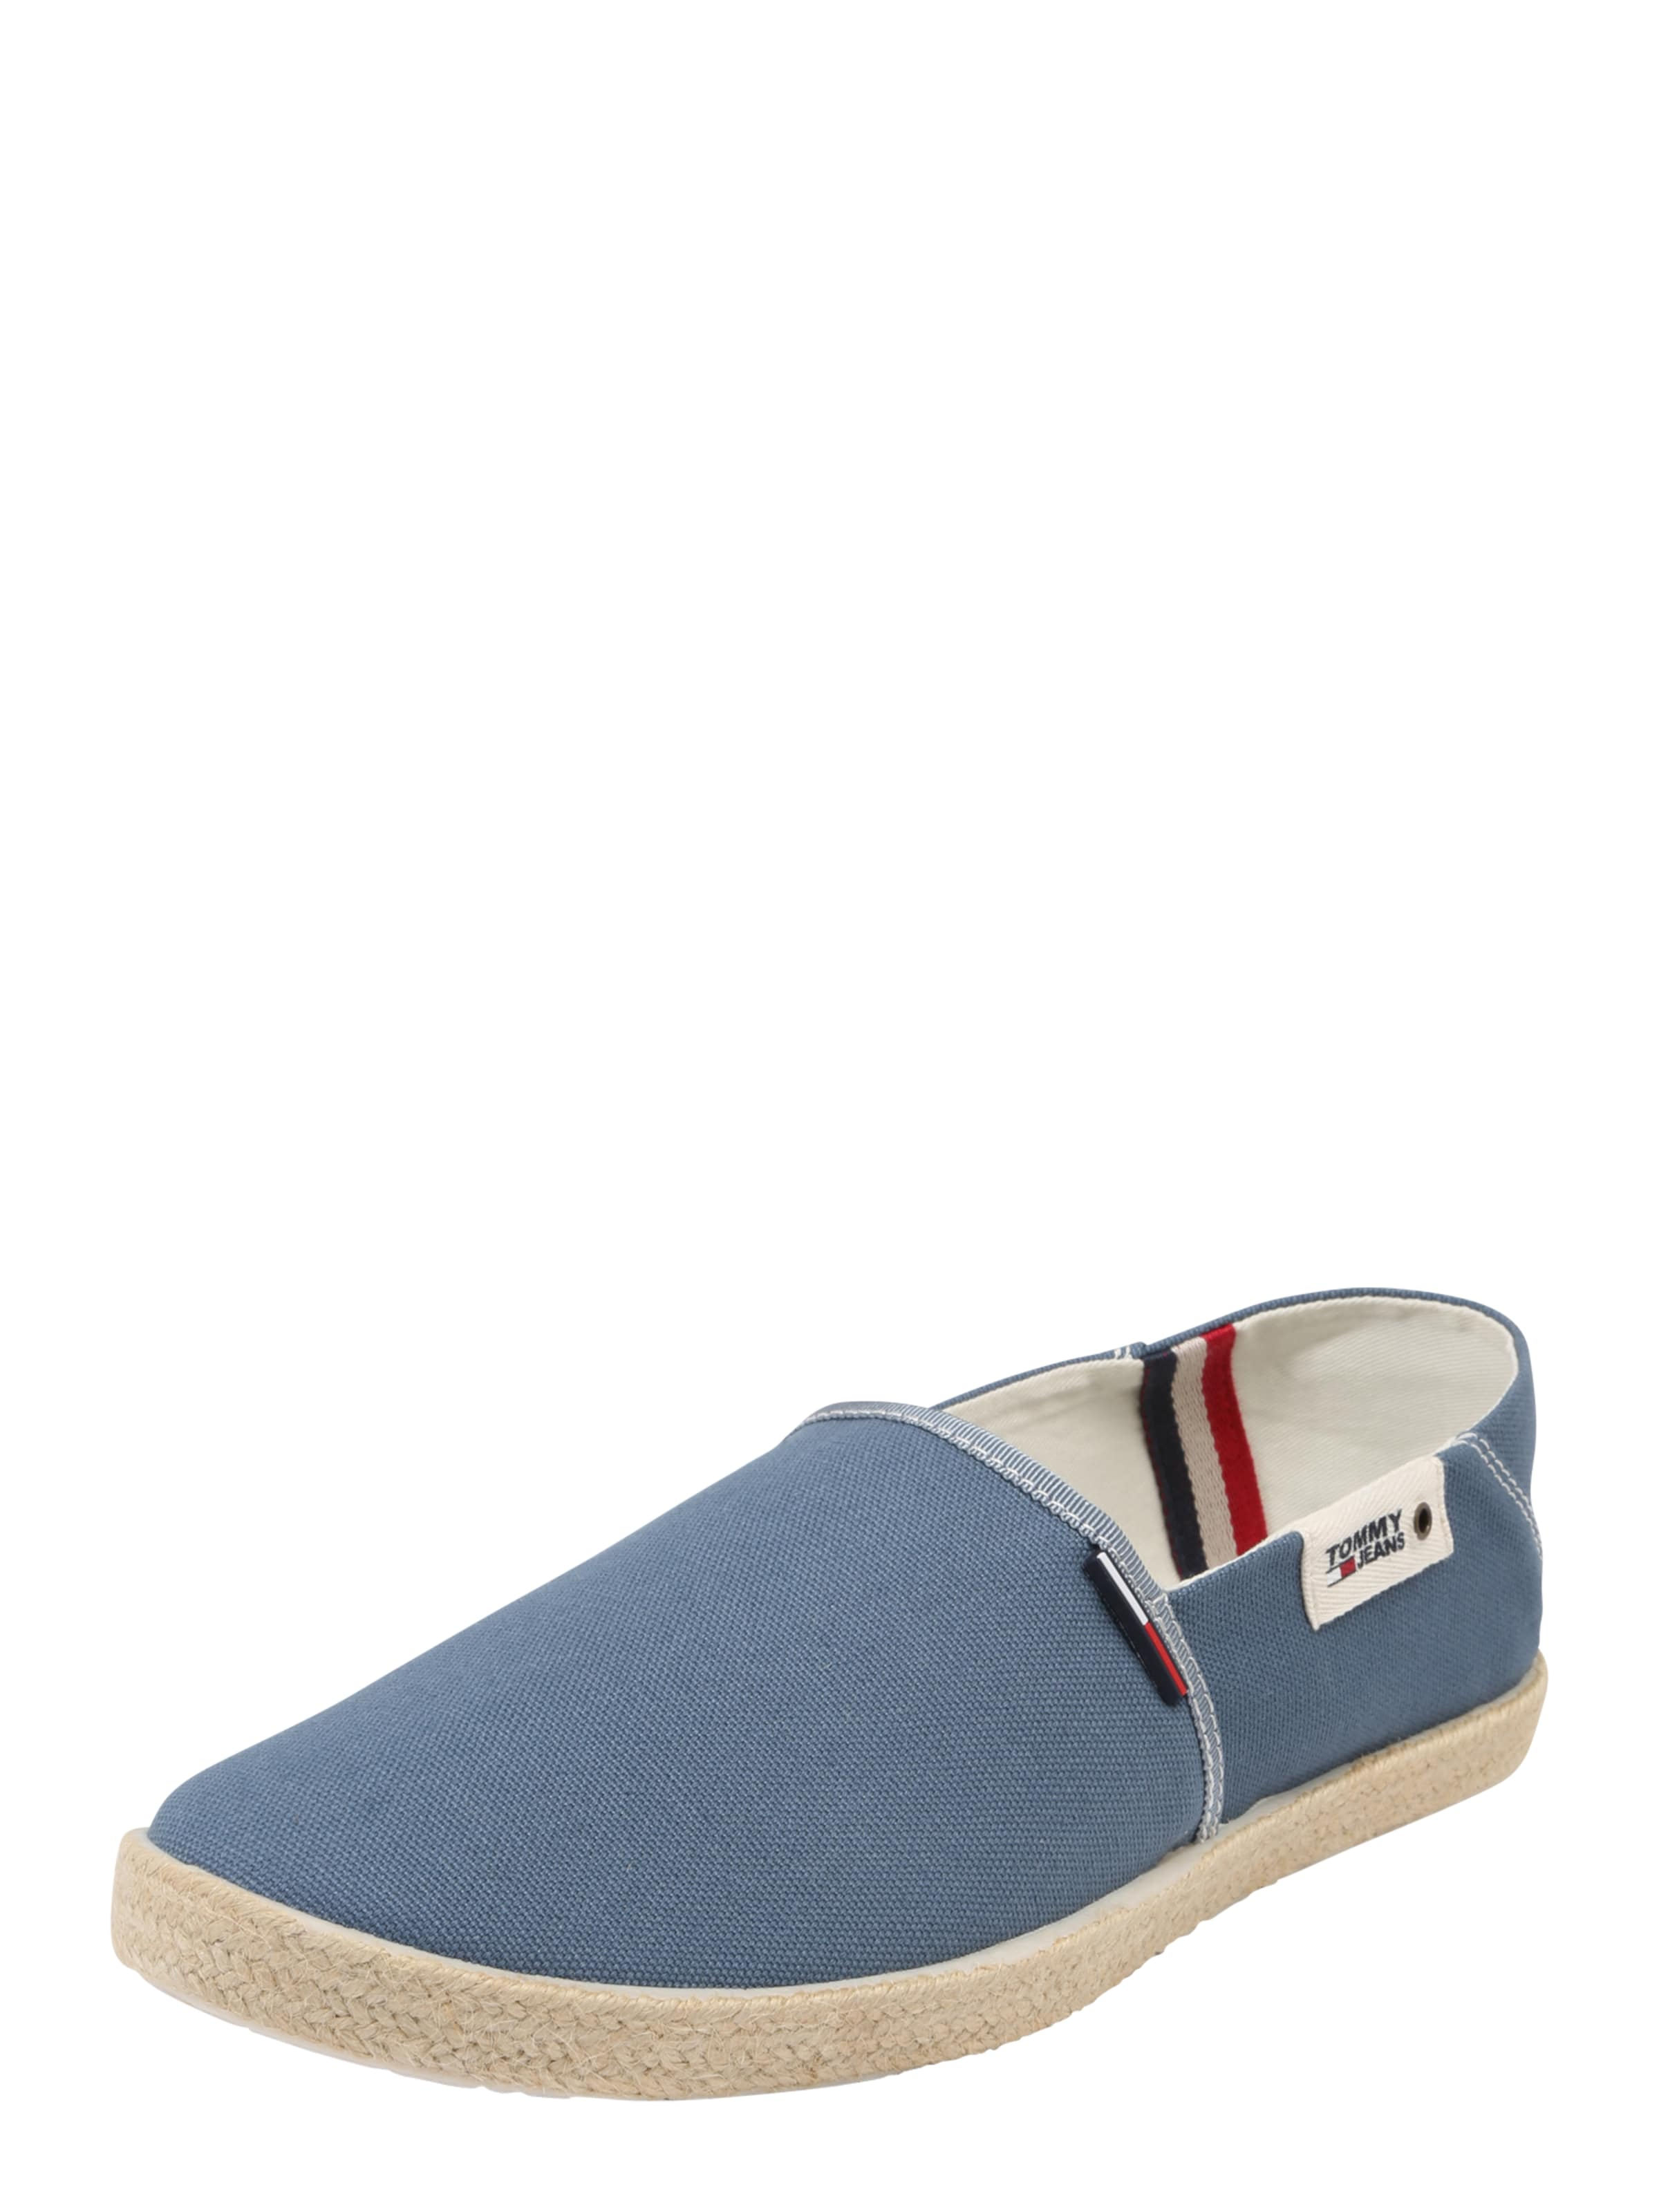 Tommy Jeans | Slipper aus Baumwolle